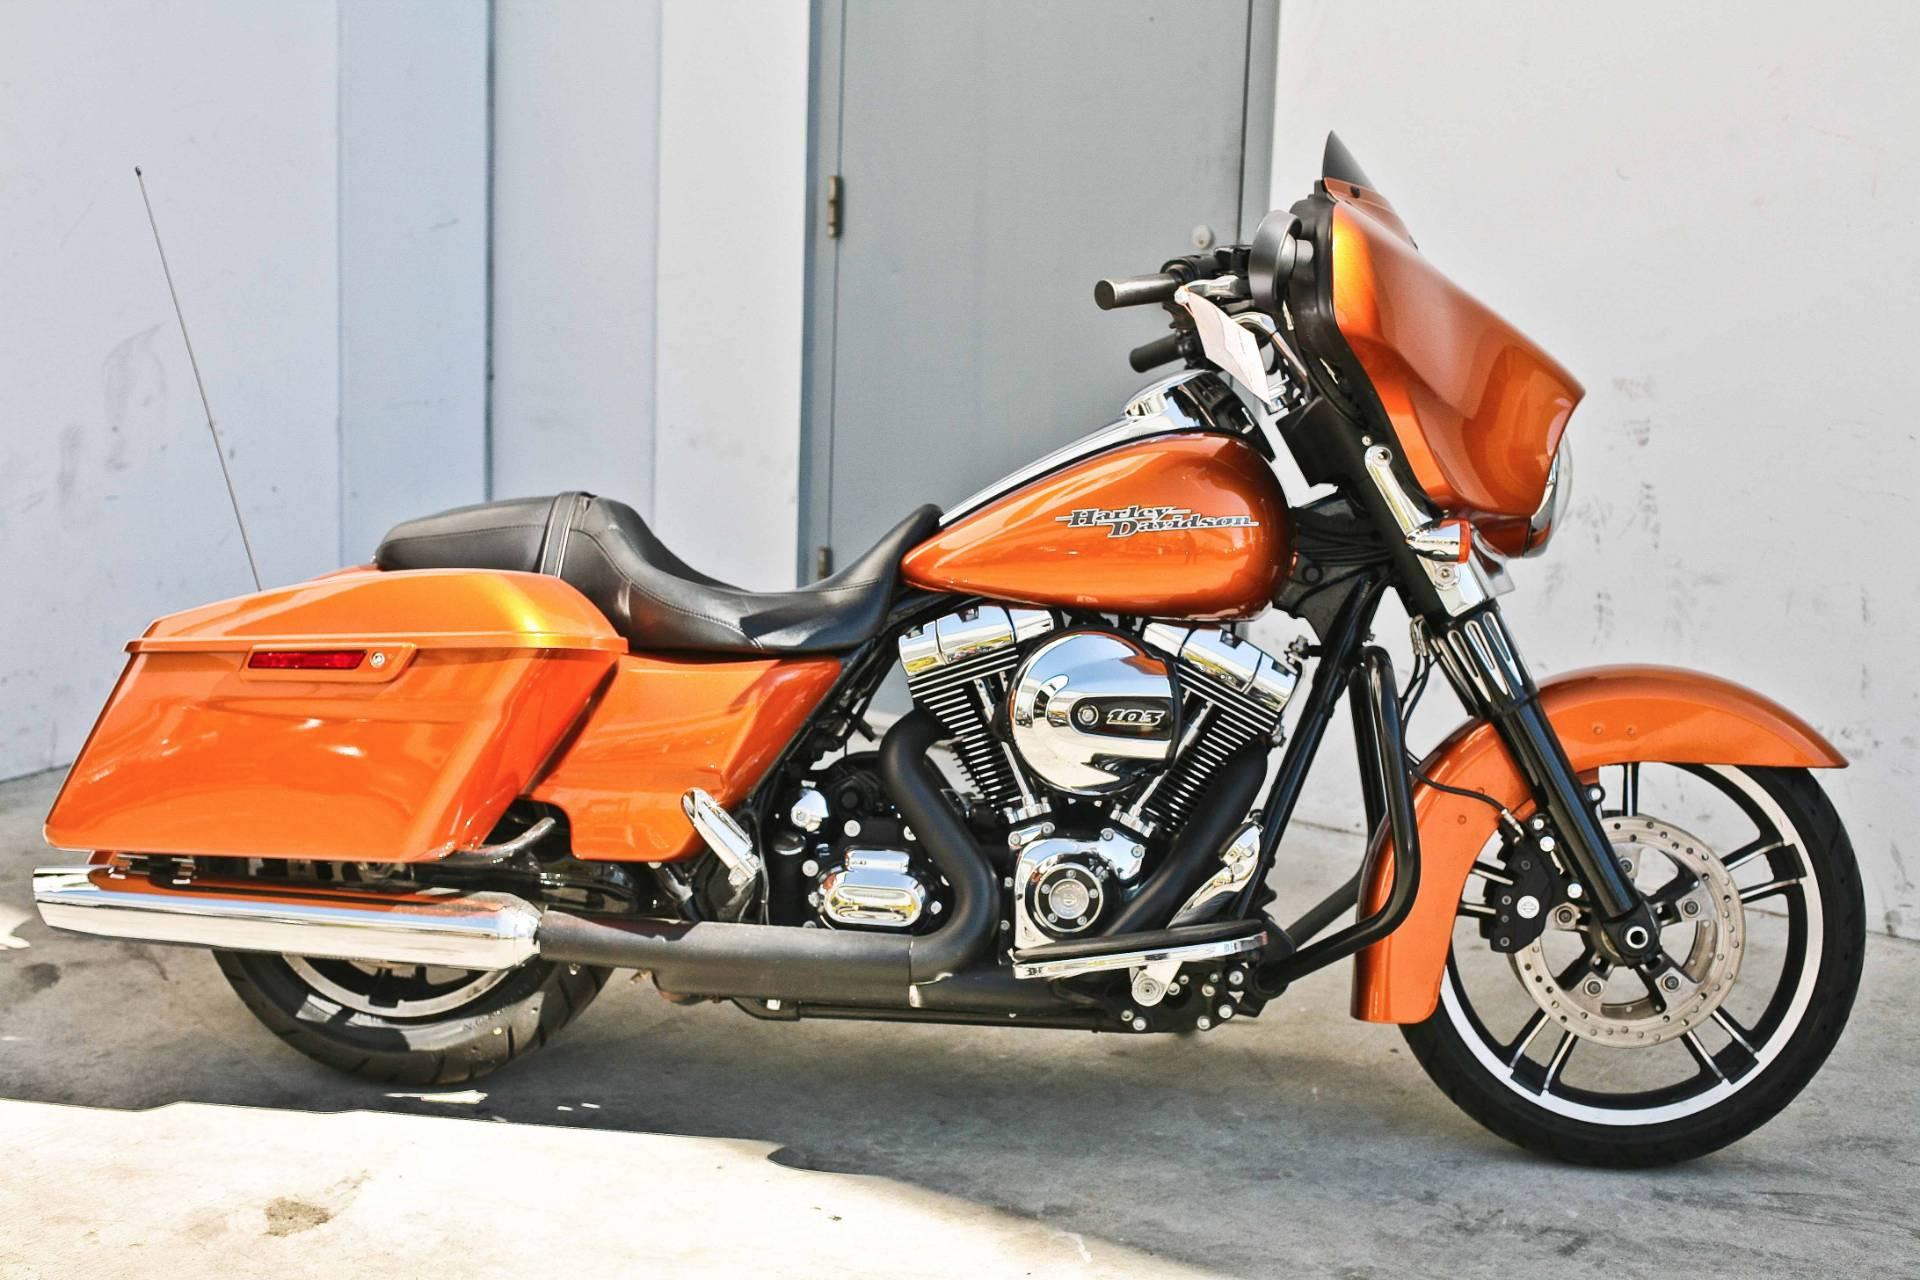 used 2014 harley davidson street glide motorcycles in moorpark ca. Black Bedroom Furniture Sets. Home Design Ideas